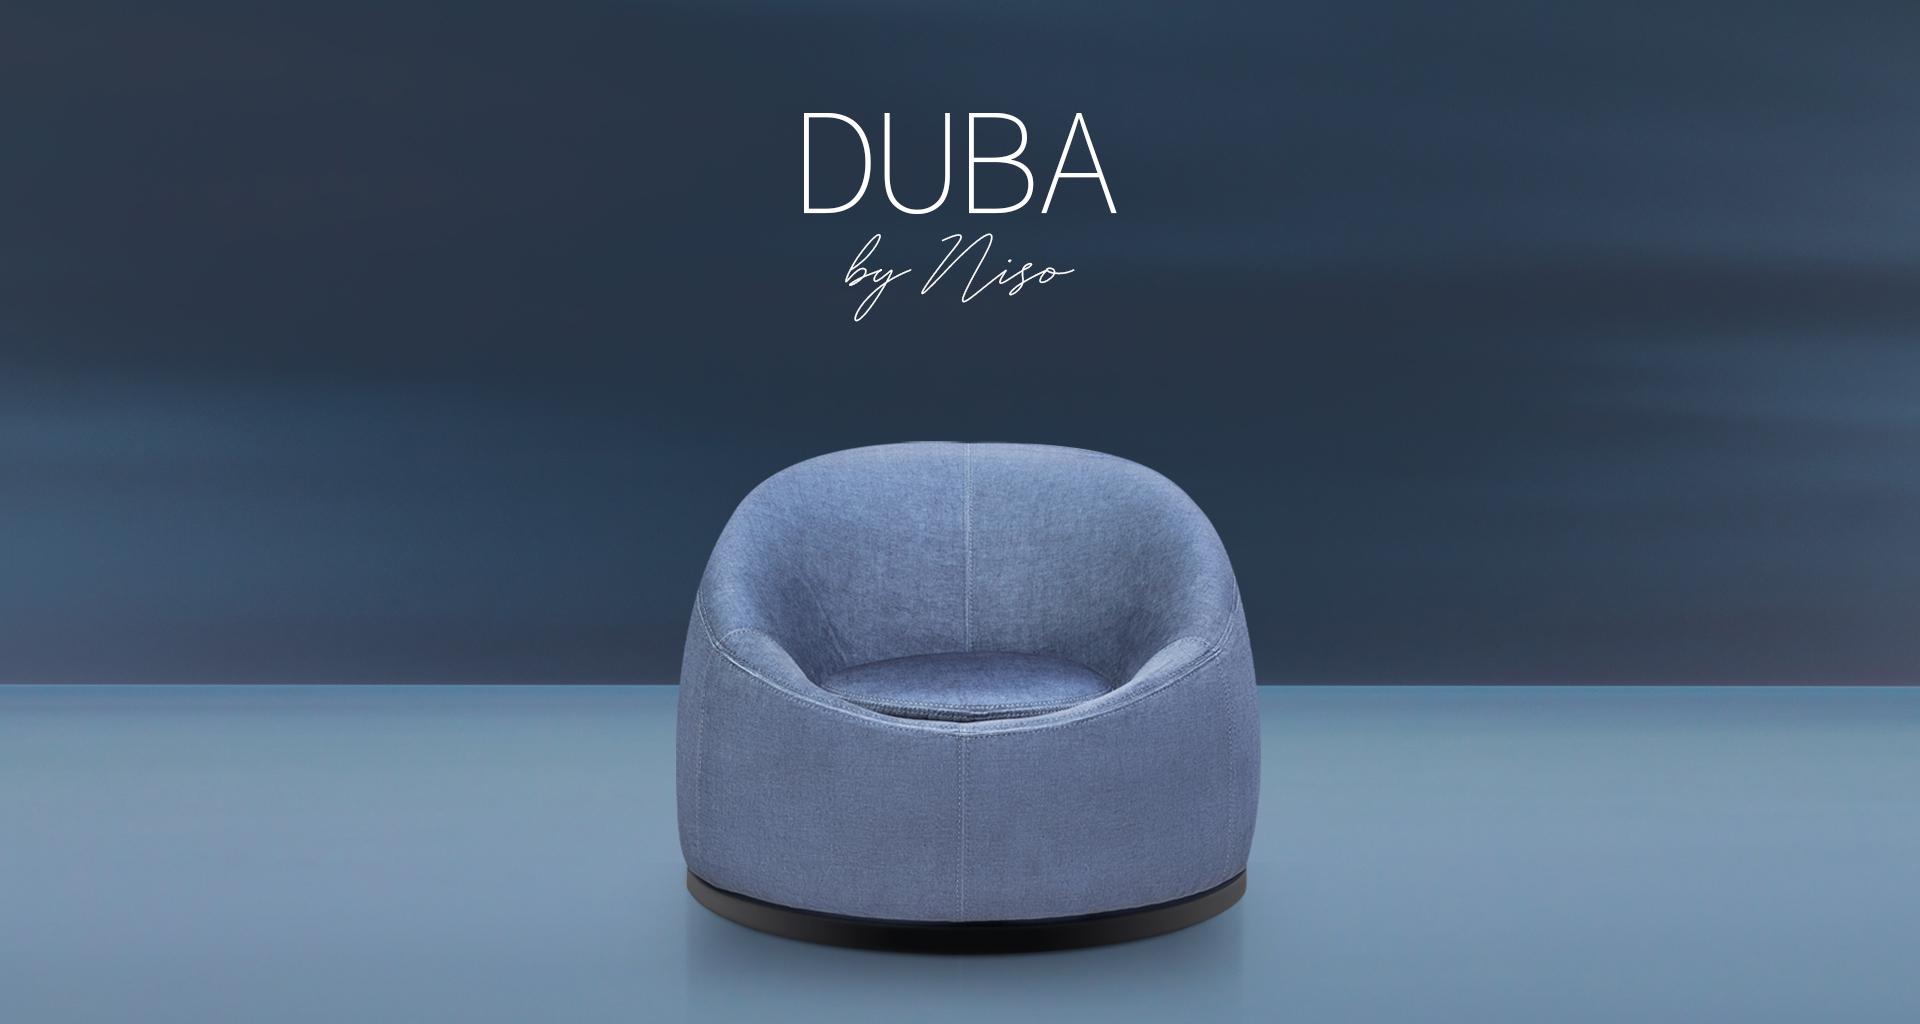 Duba Web Bnr1920x1024